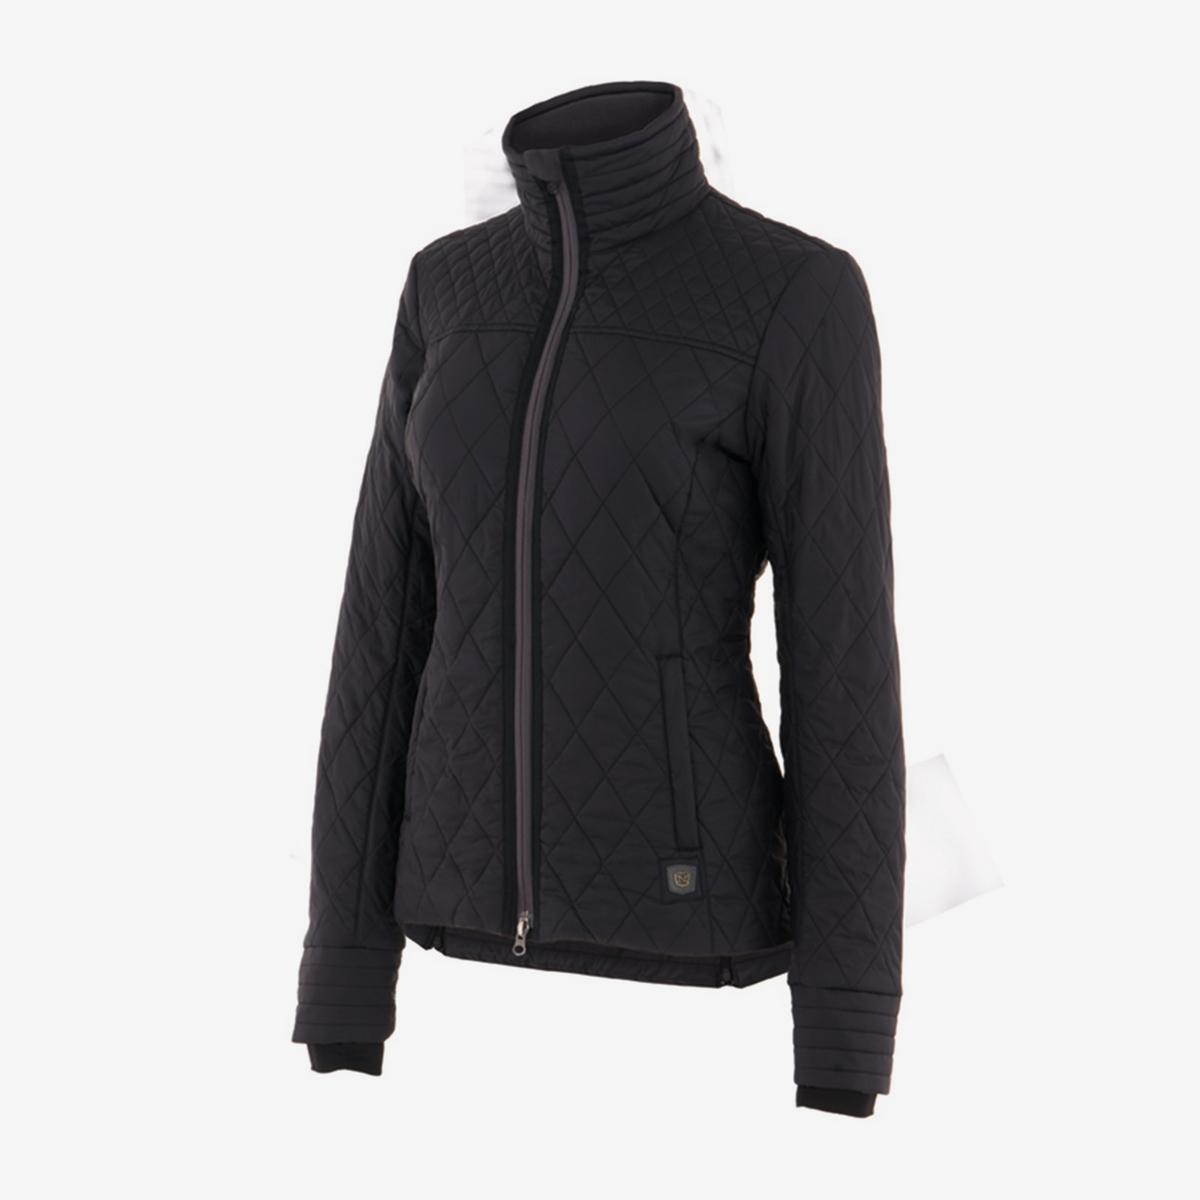 e948d1e6 Noble Outfitters Warmup vattert jakke   Horze